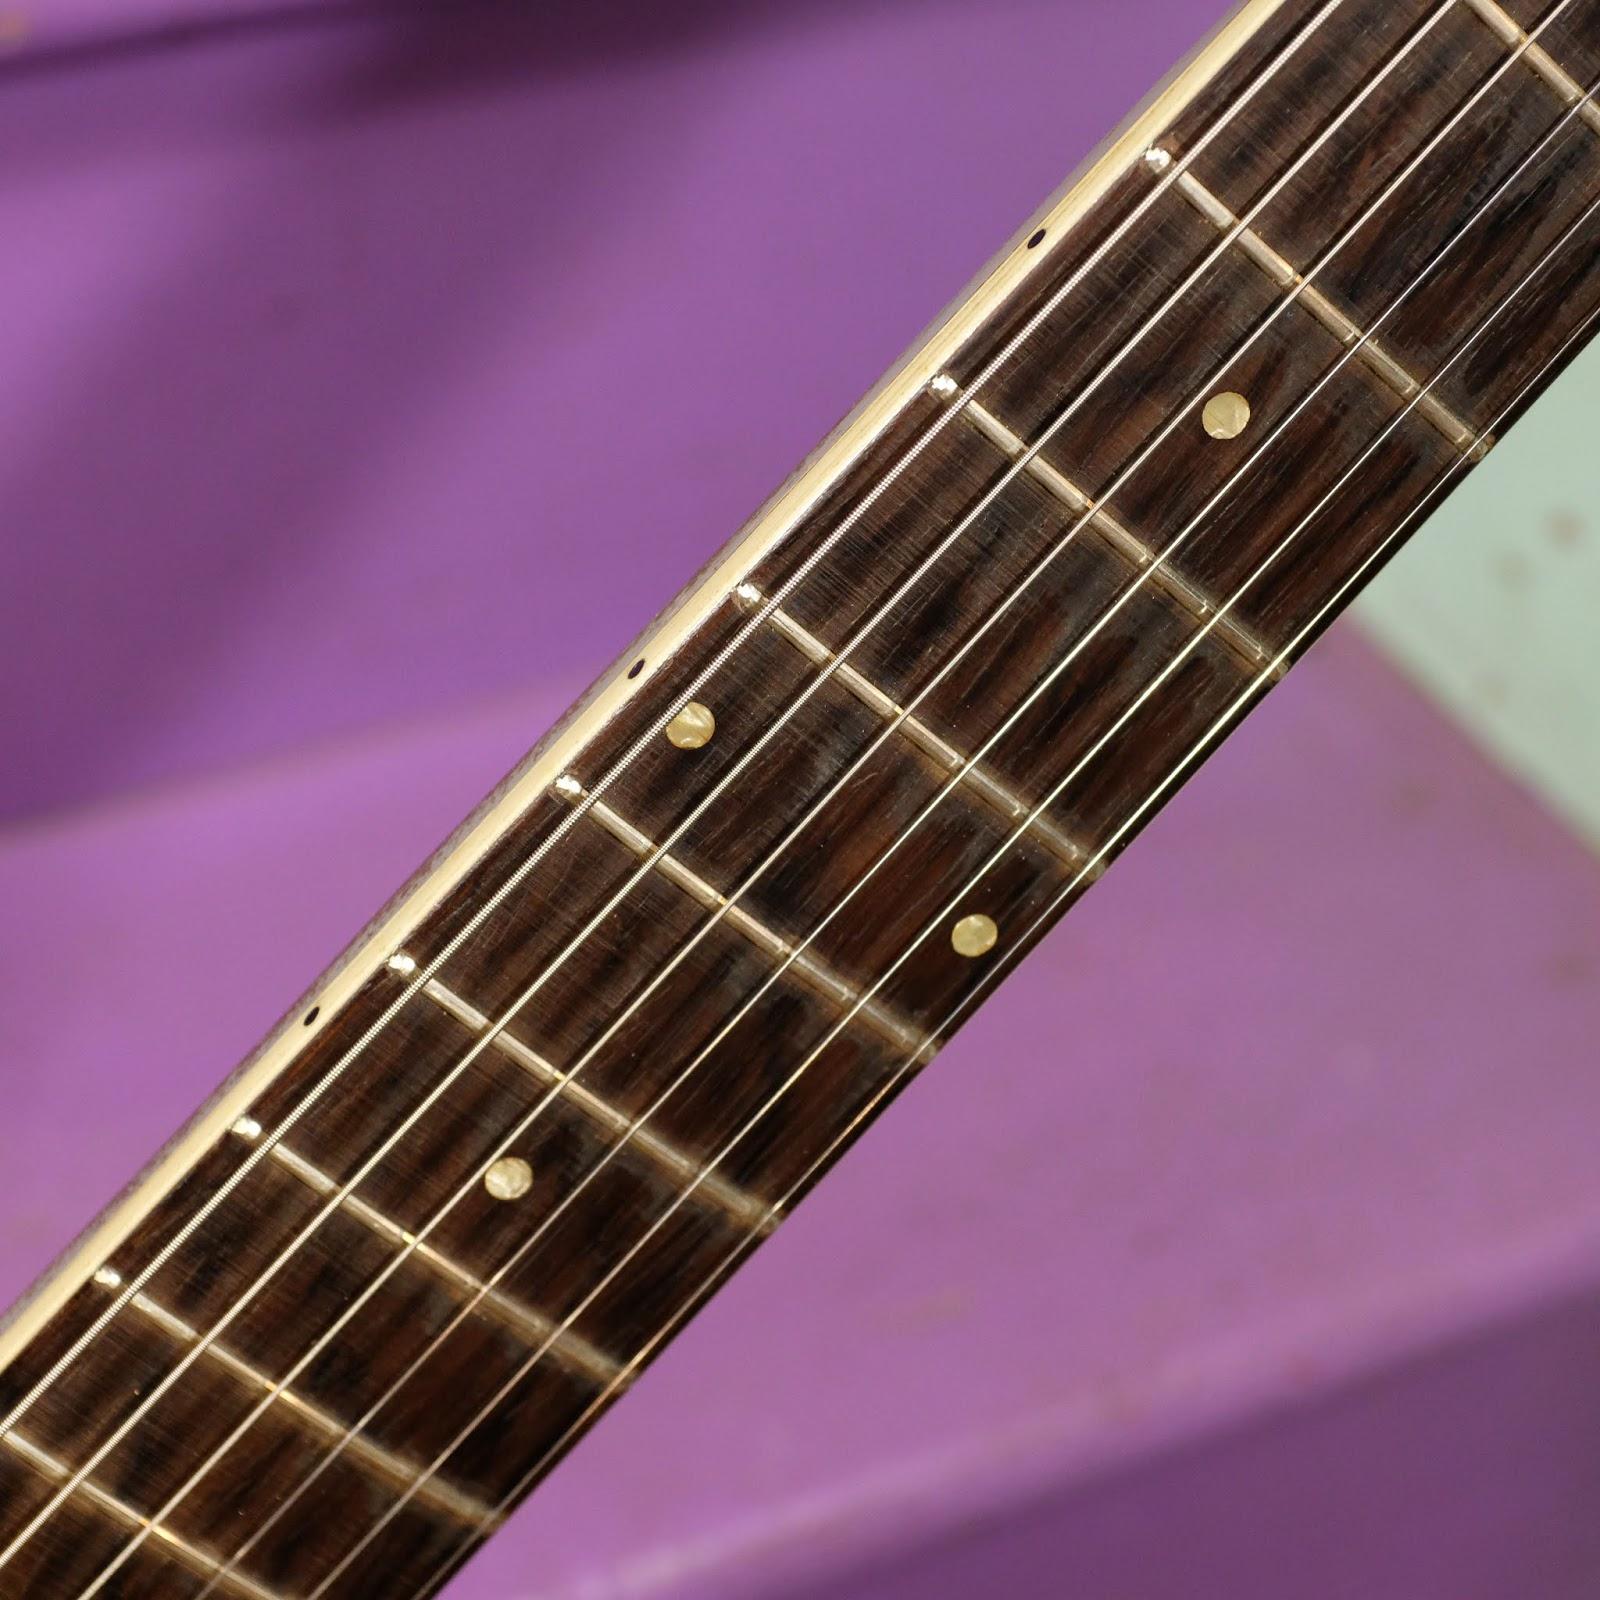 medium resolution of wiring diagram on harmony h78 harmony guitars 1950s harmony h44 stratotone electric guitar on harmony h78 harmony guitars harmony insurance